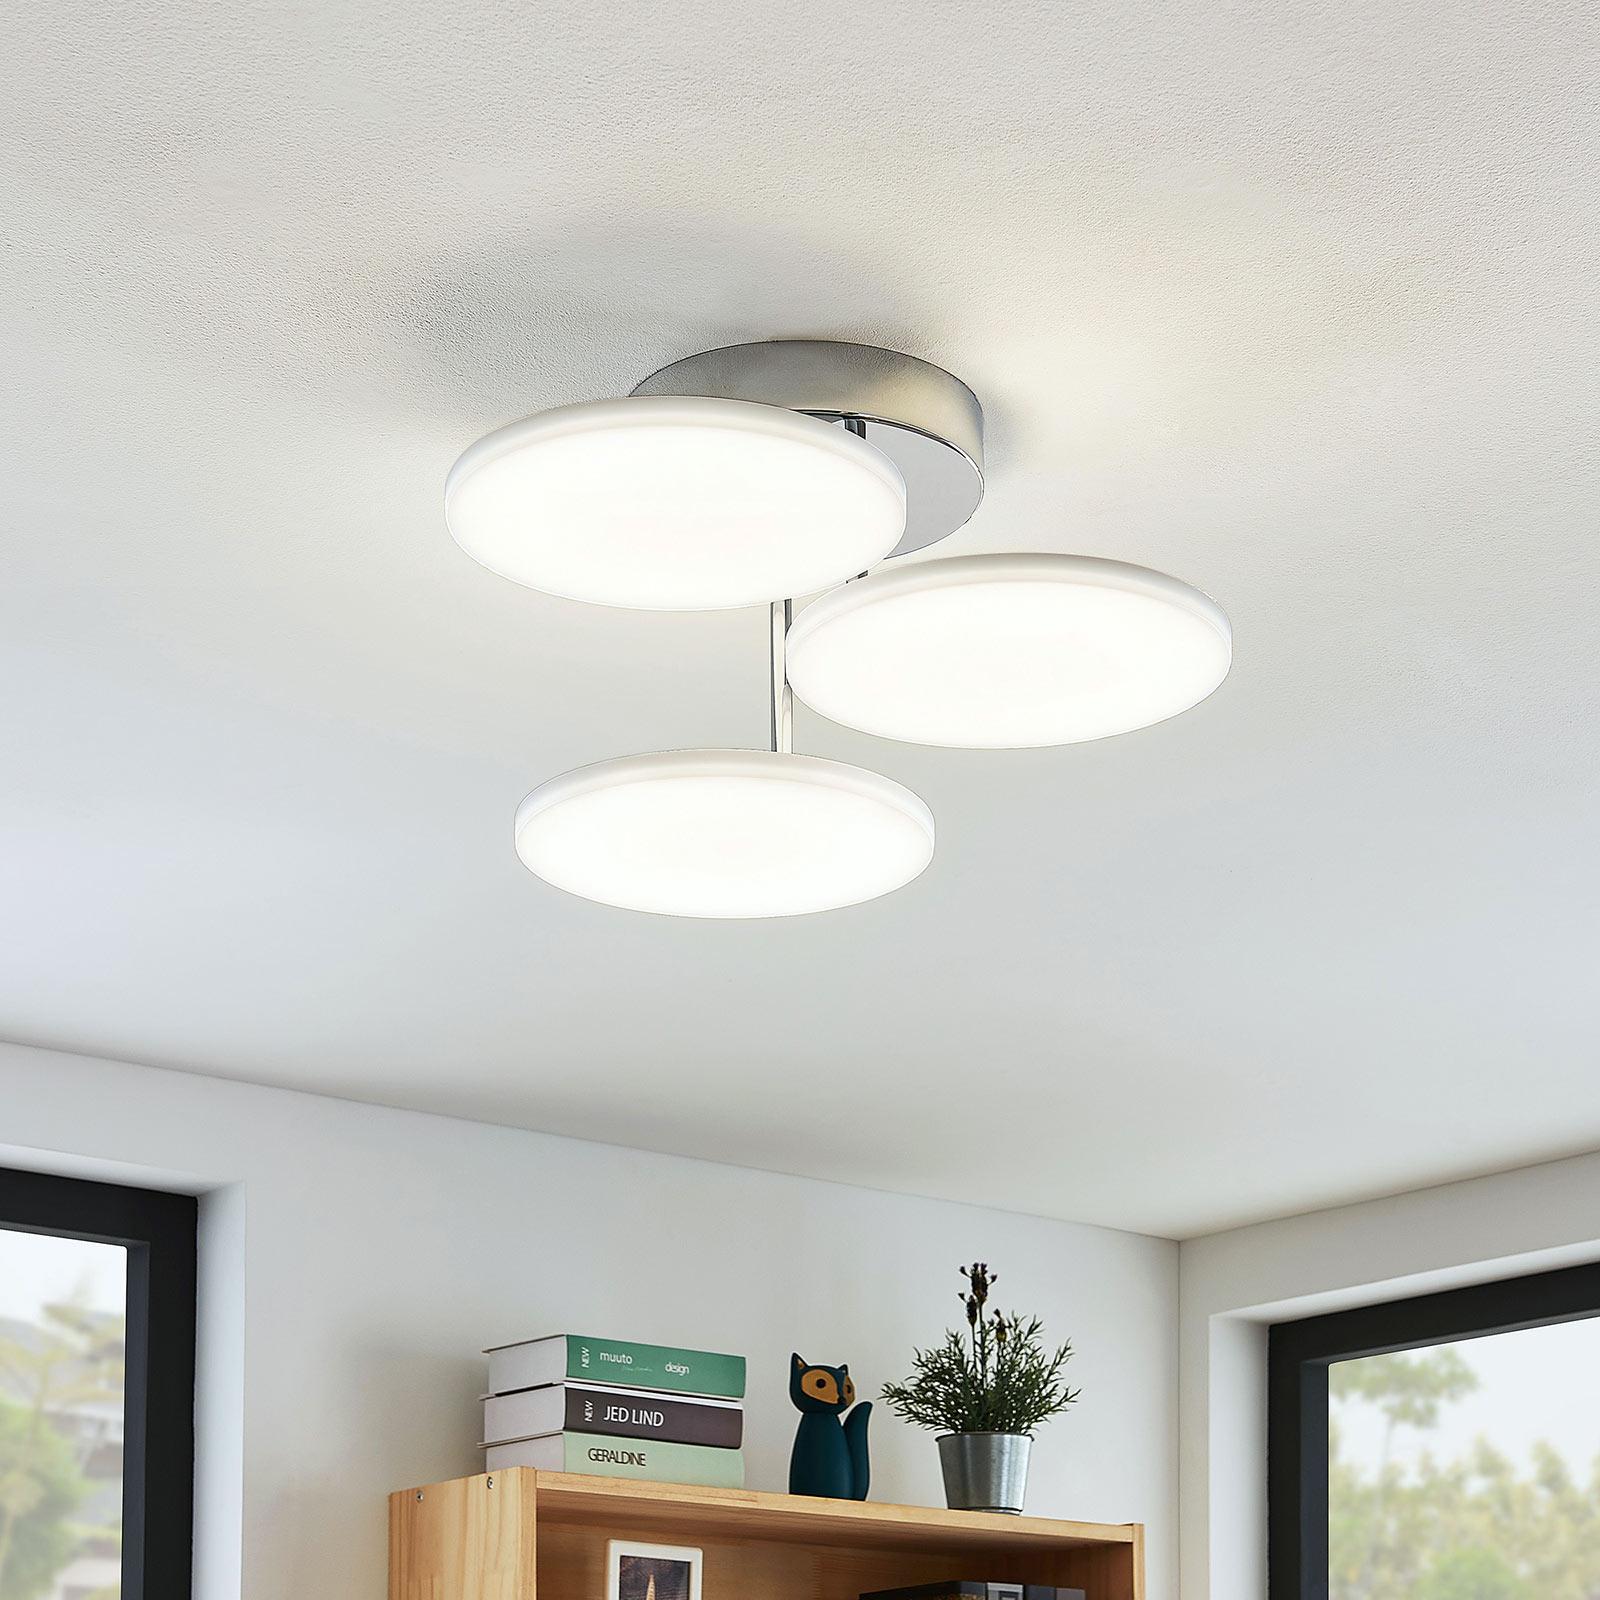 Lampa sufitowa LED Sherko, ściemniana, 3-punktowa